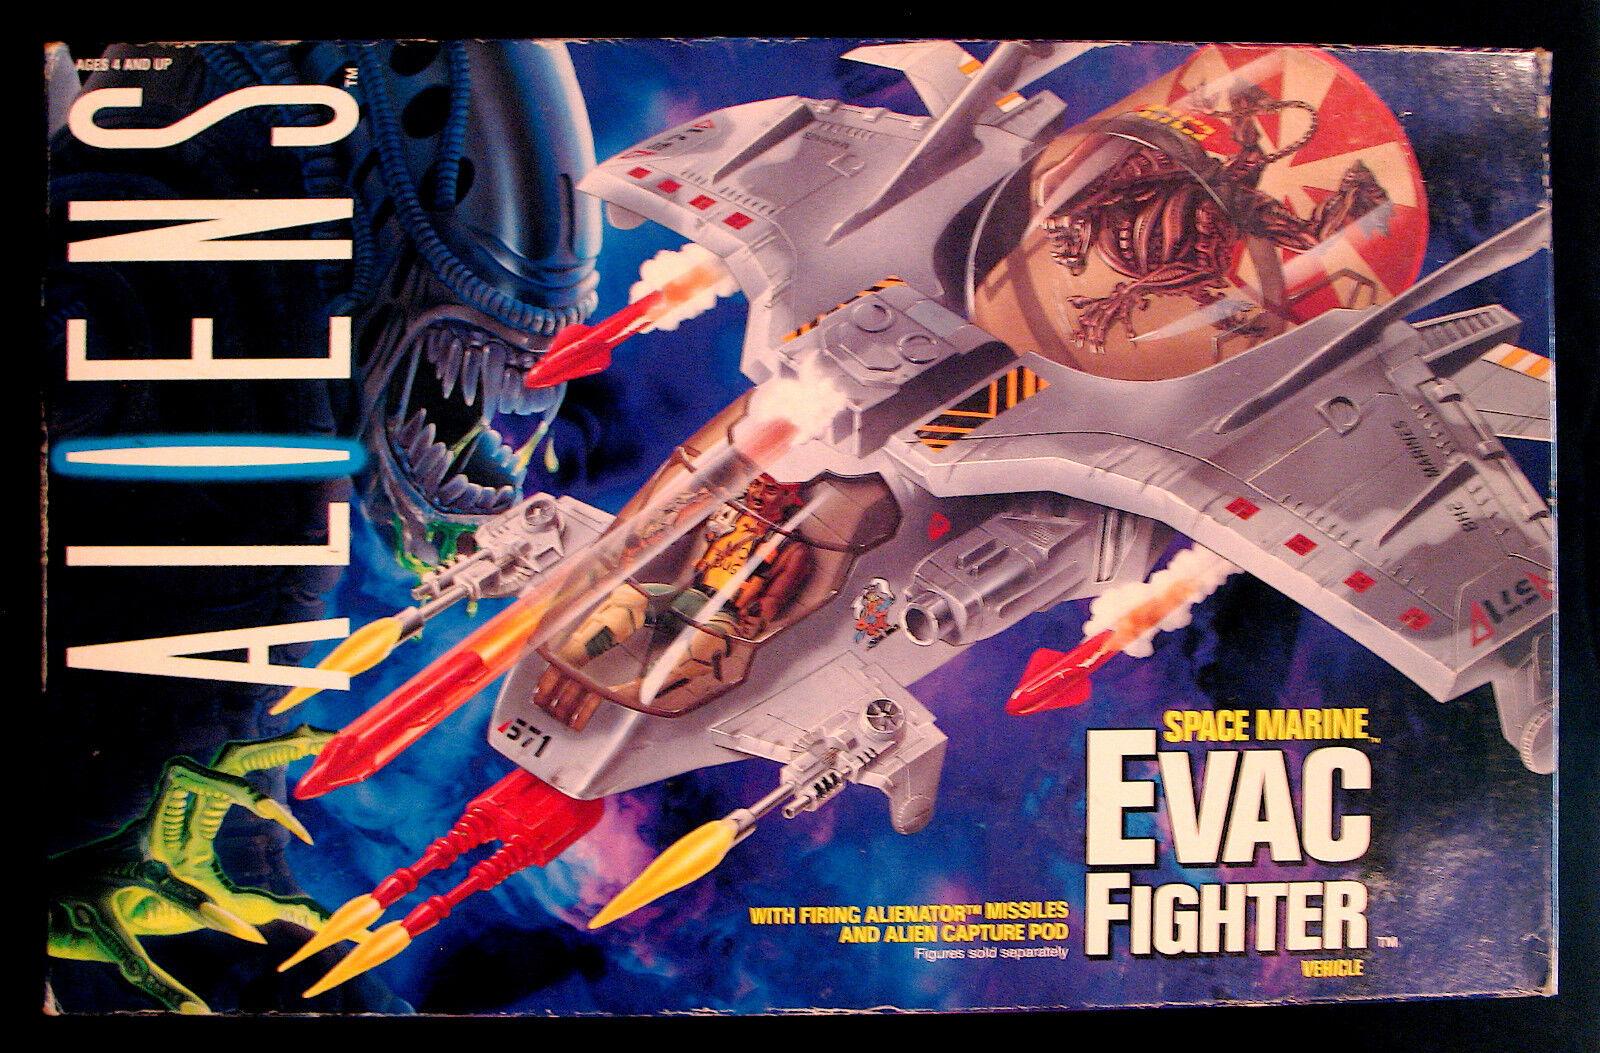 ALIENS-SPACE MARINE EVAC FIGHTER-Unopened-1992 Vintage Toy-KENNER